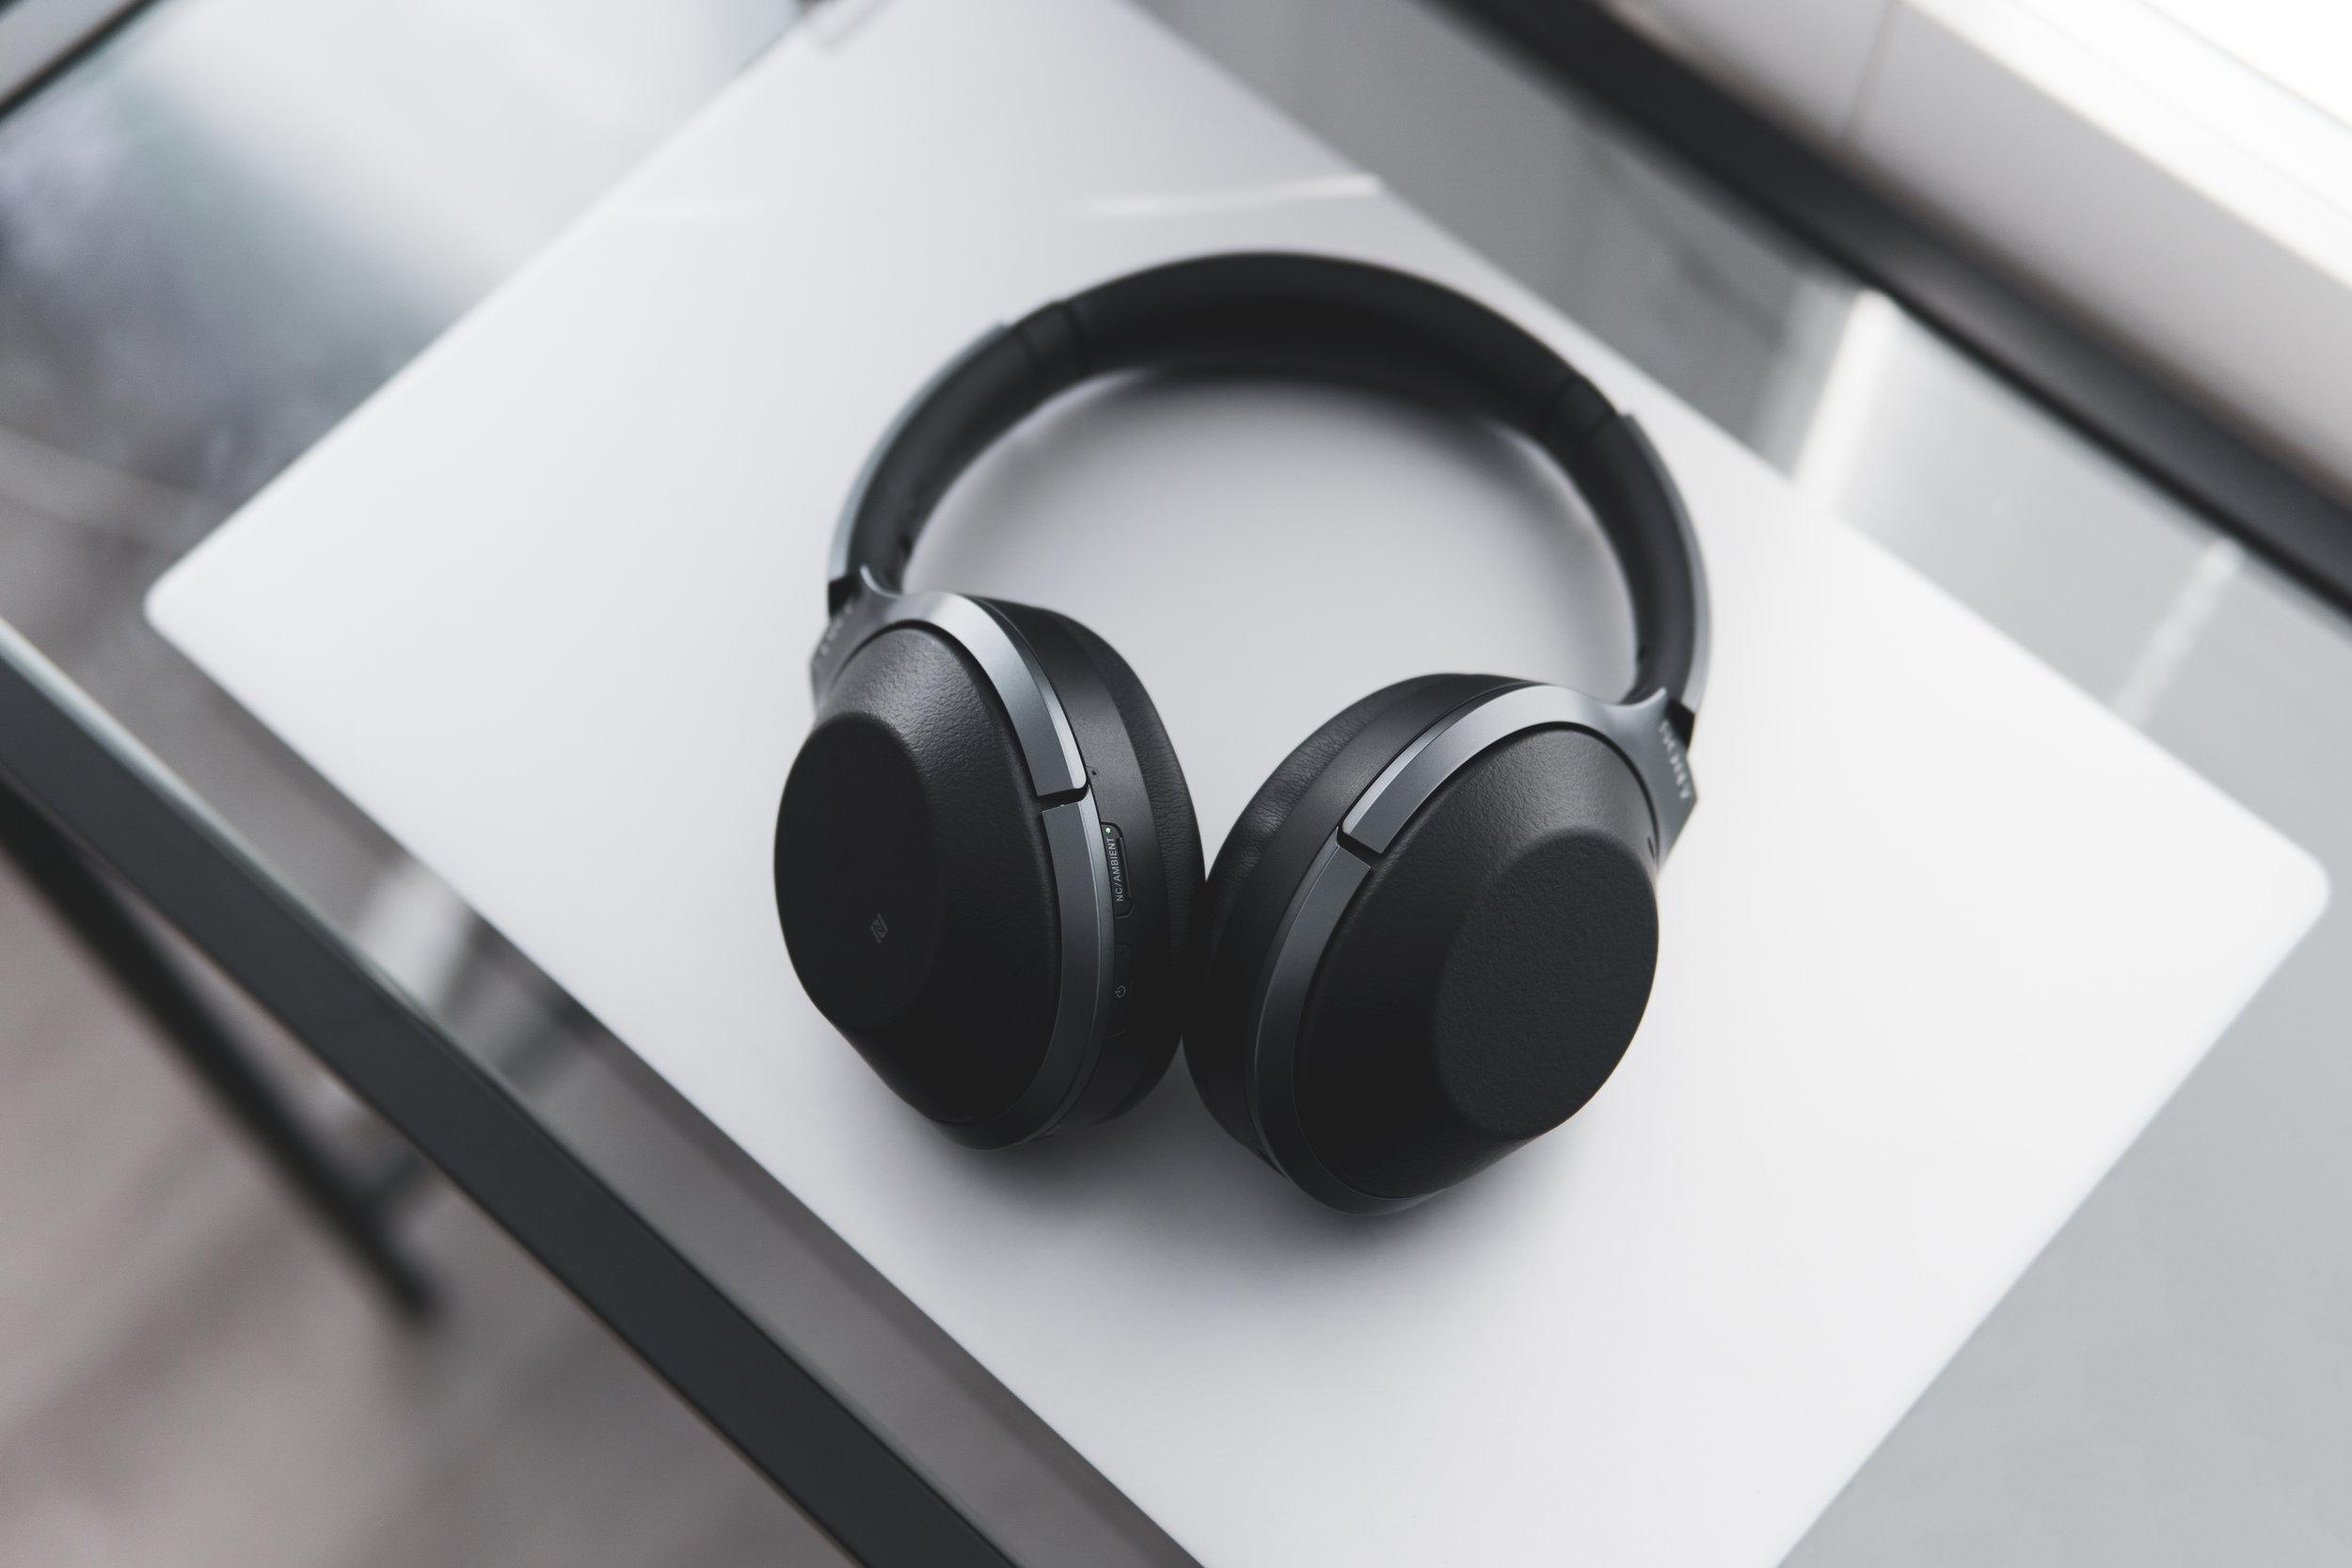 noise canceling headphones on a desk